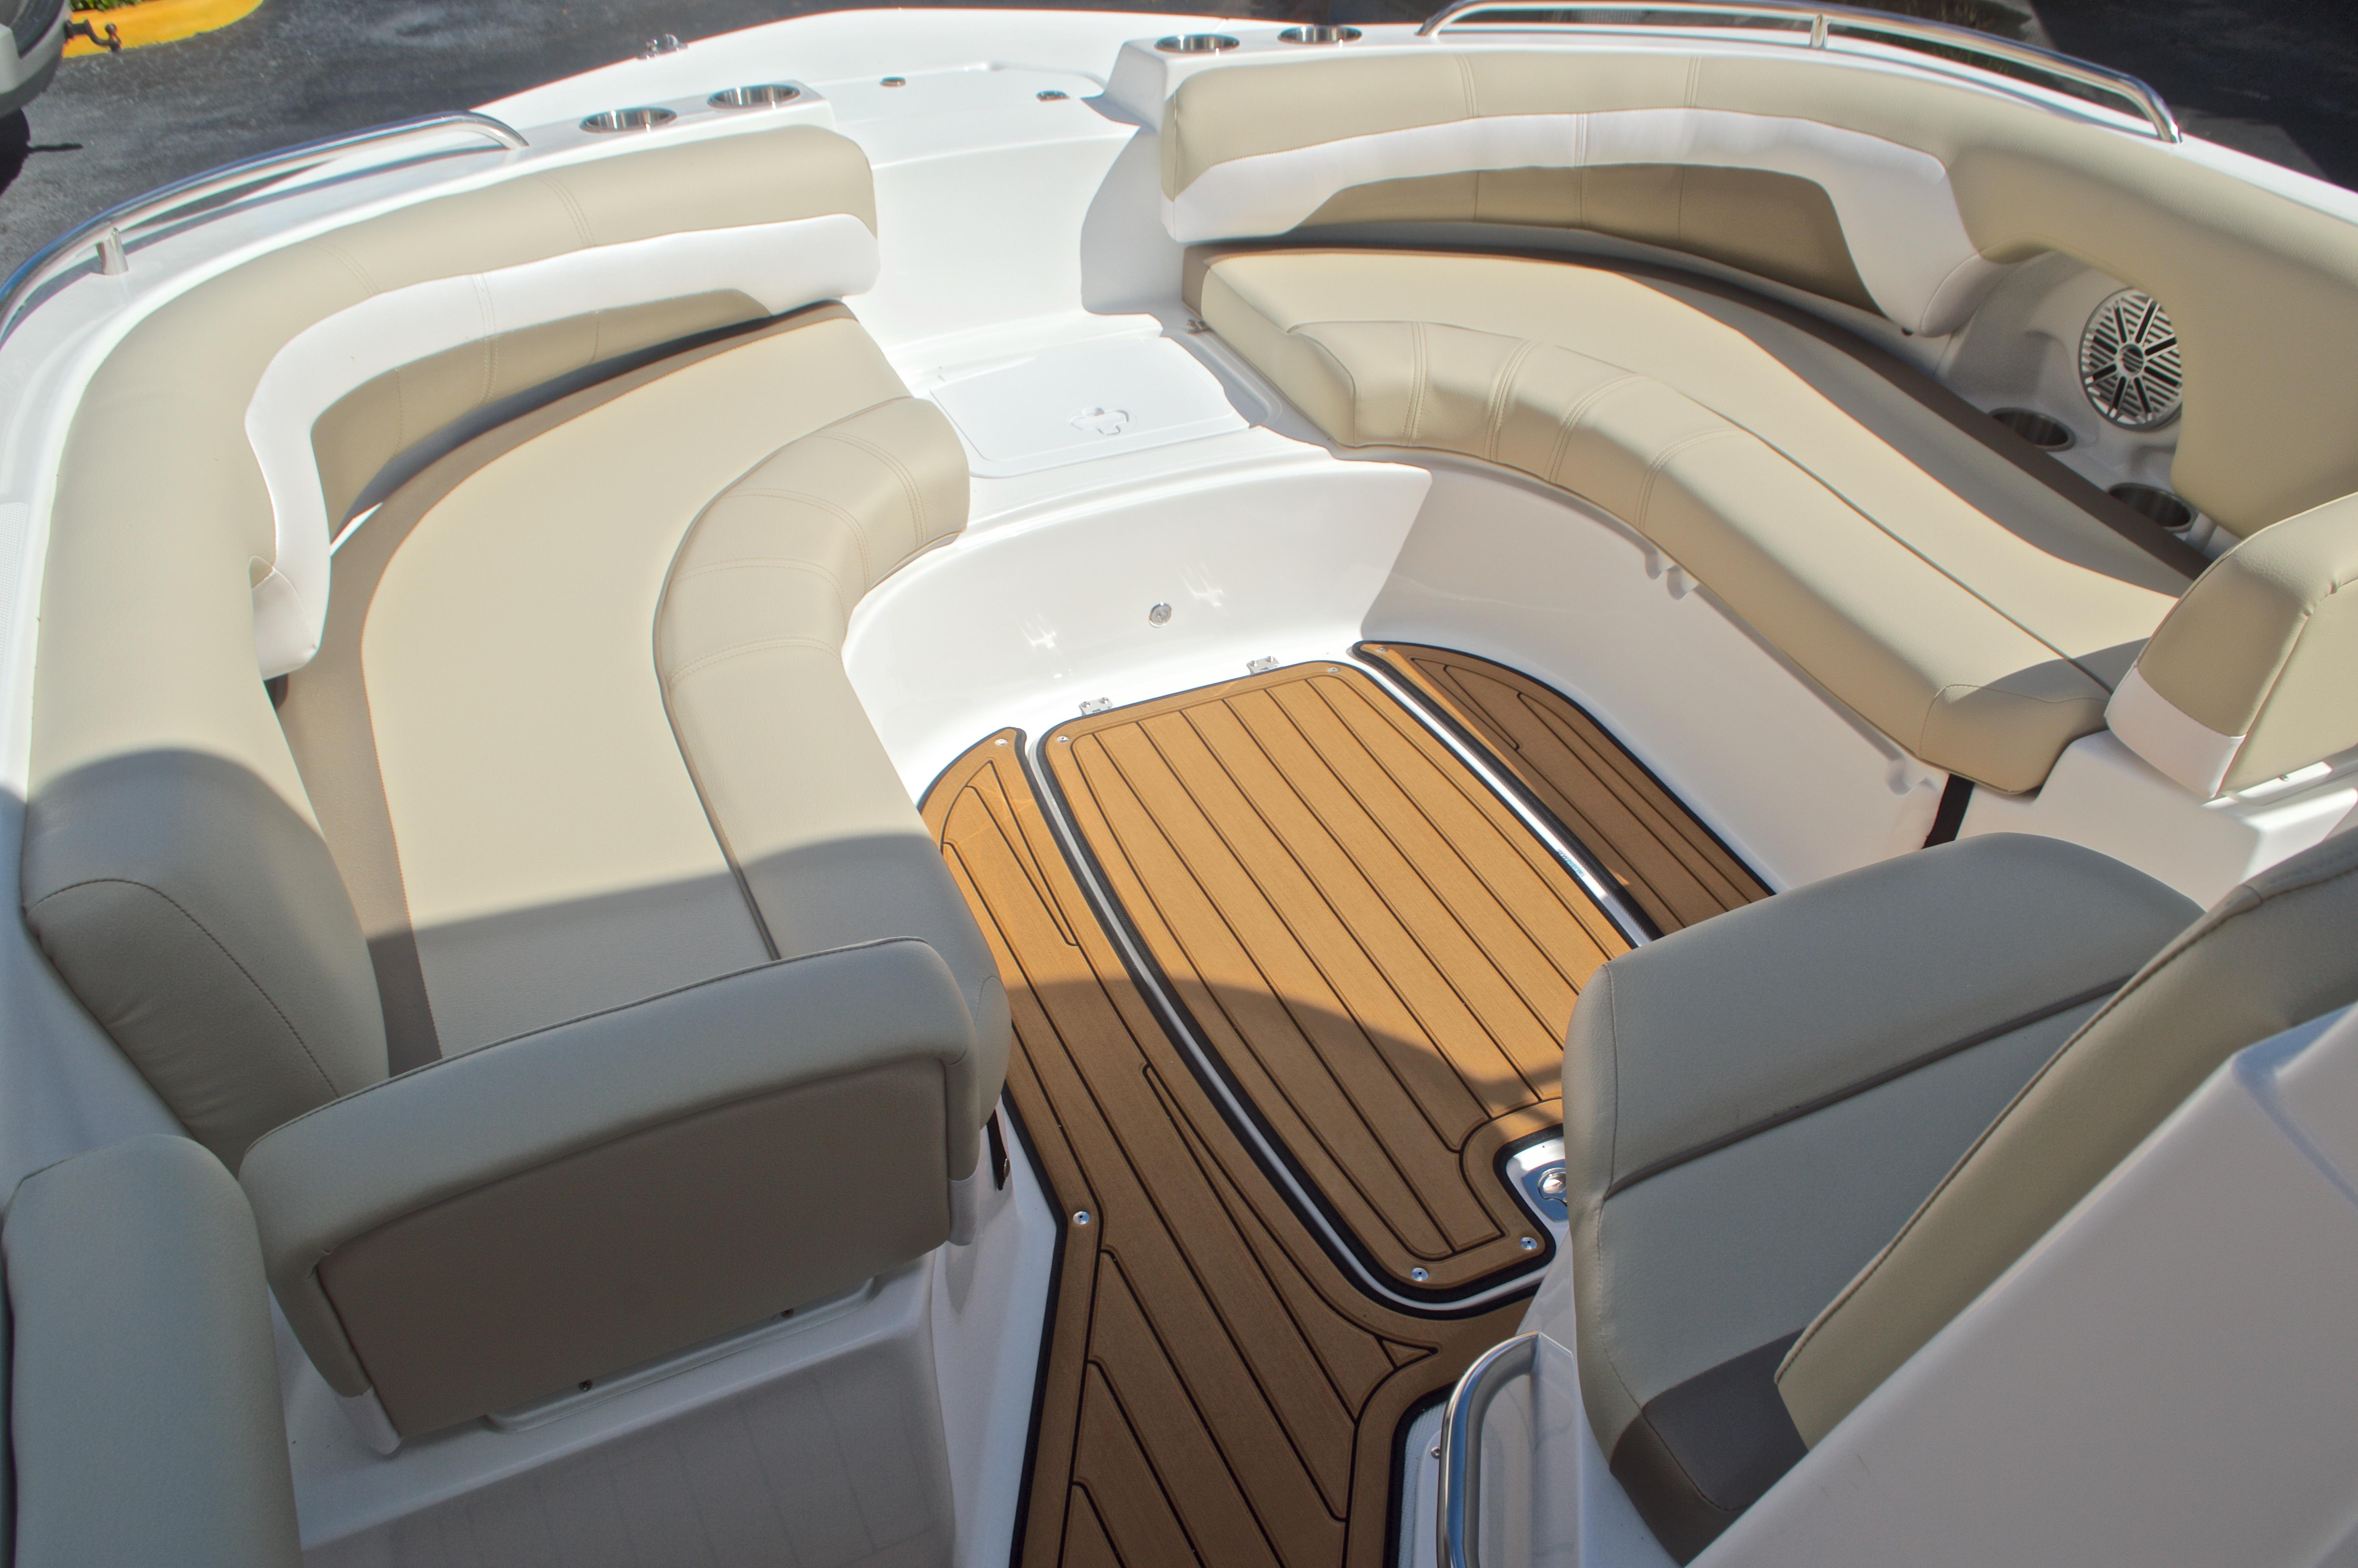 Thumbnail 38 for New 2017 Hurricane CC21 Center Console boat for sale in Vero Beach, FL